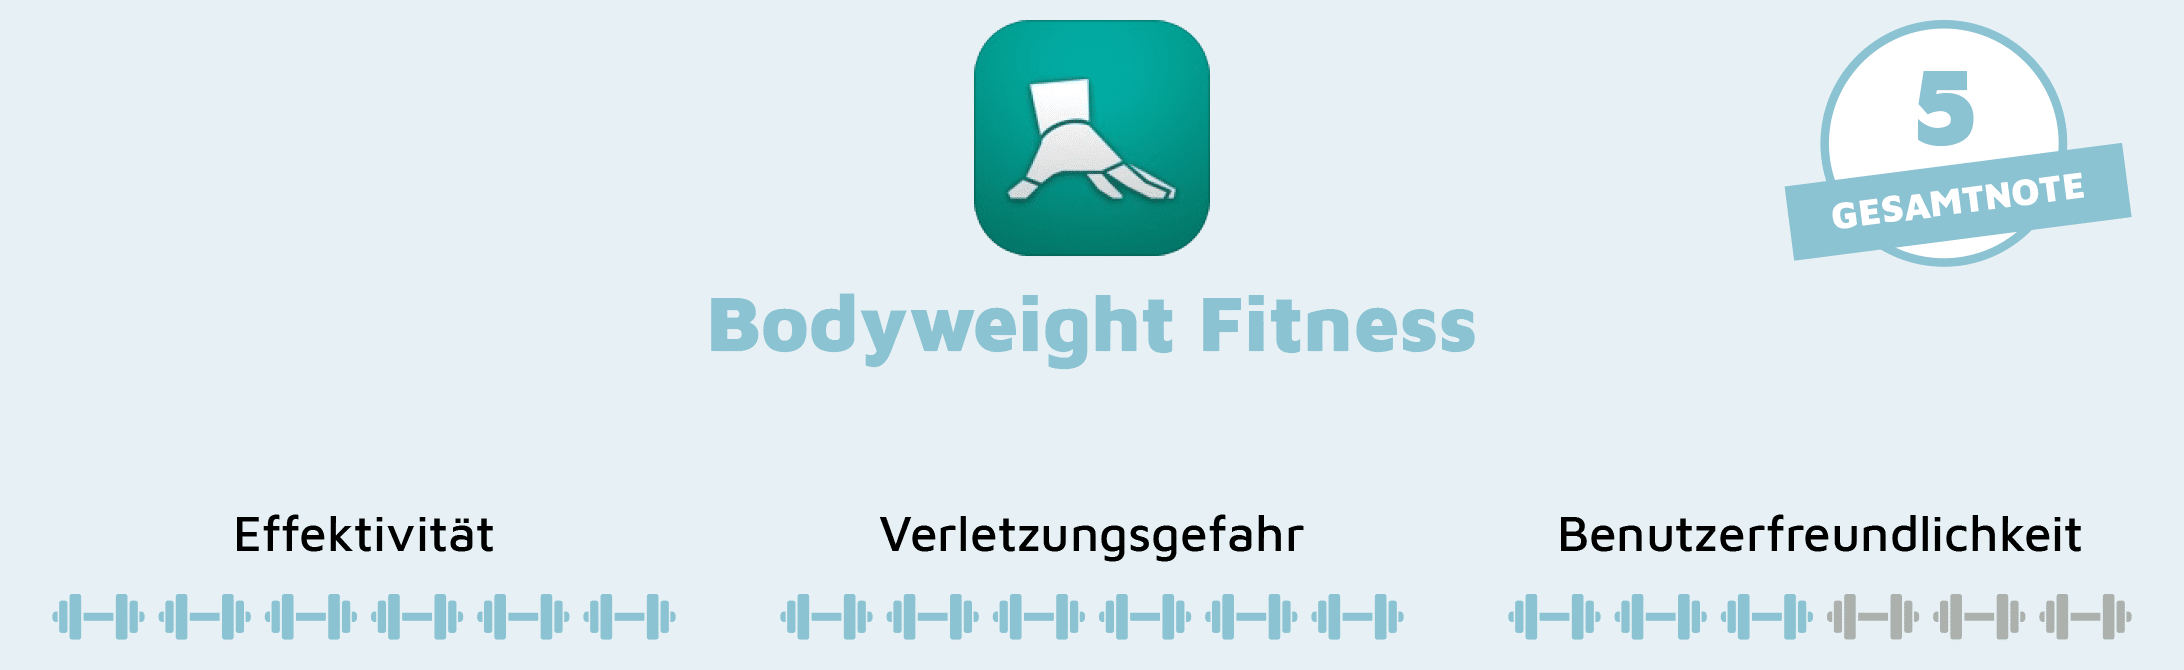 Fazit der App Bodyweight Fitness